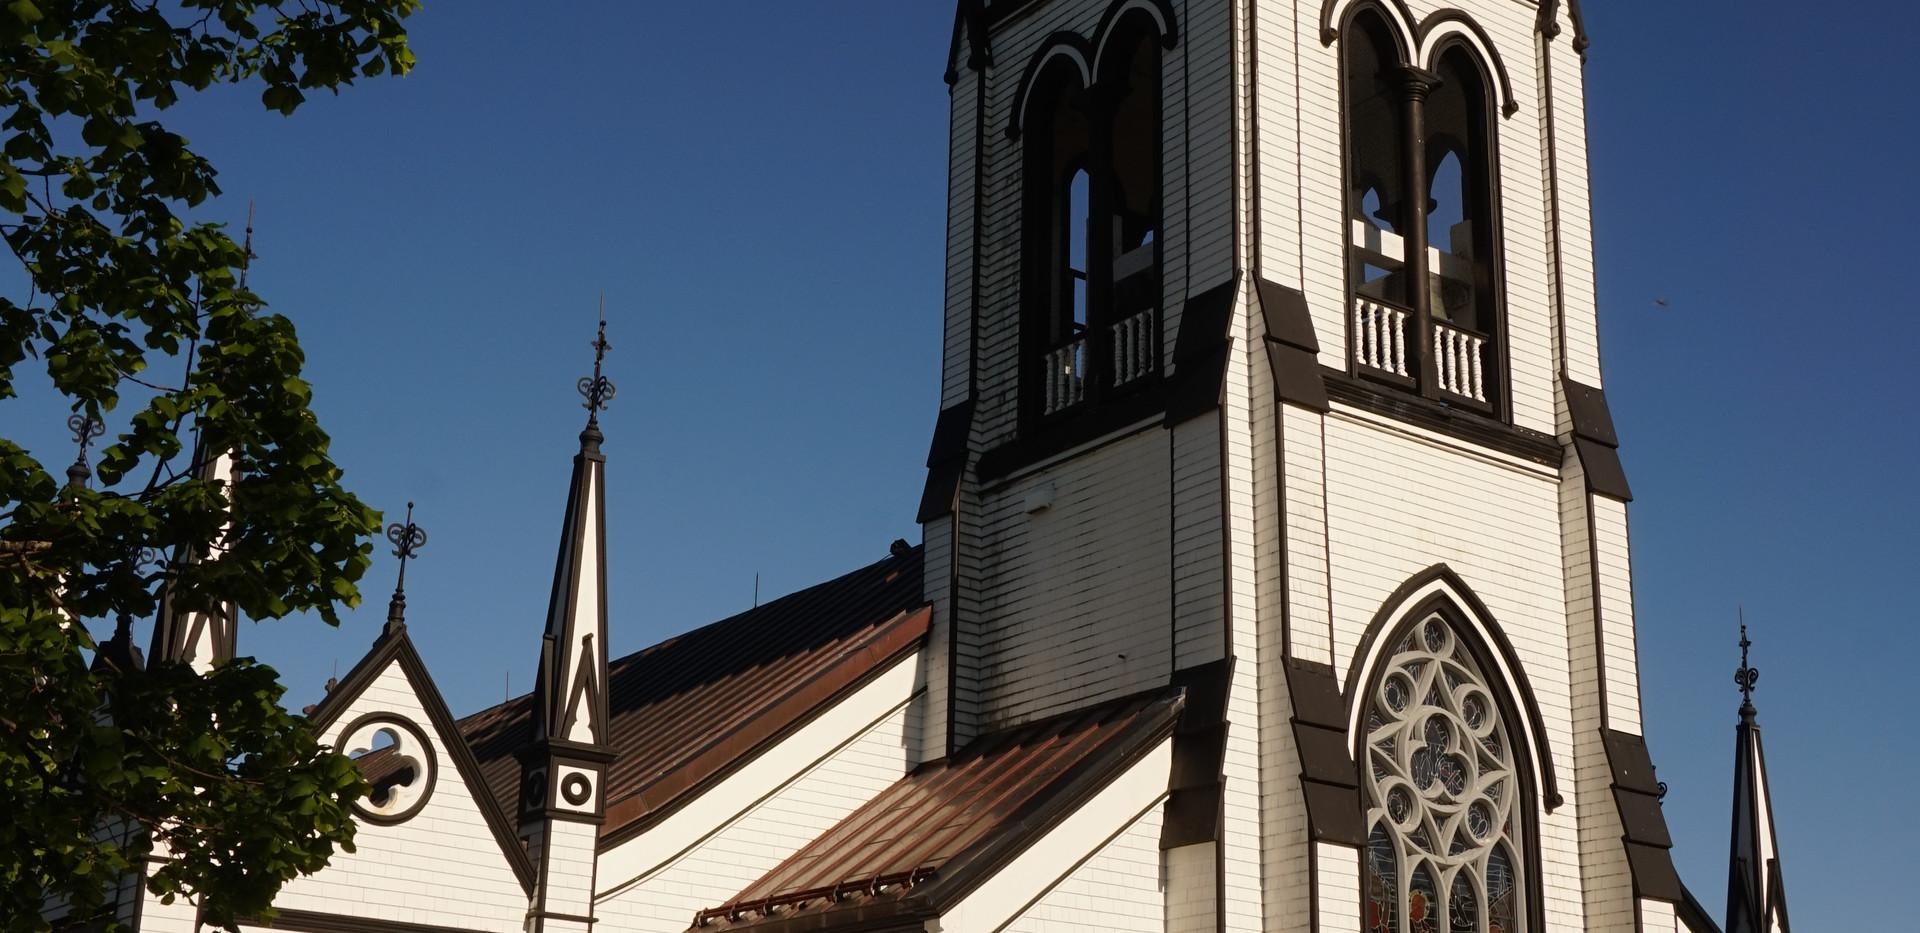 Eglise anglicane Lunenbourg